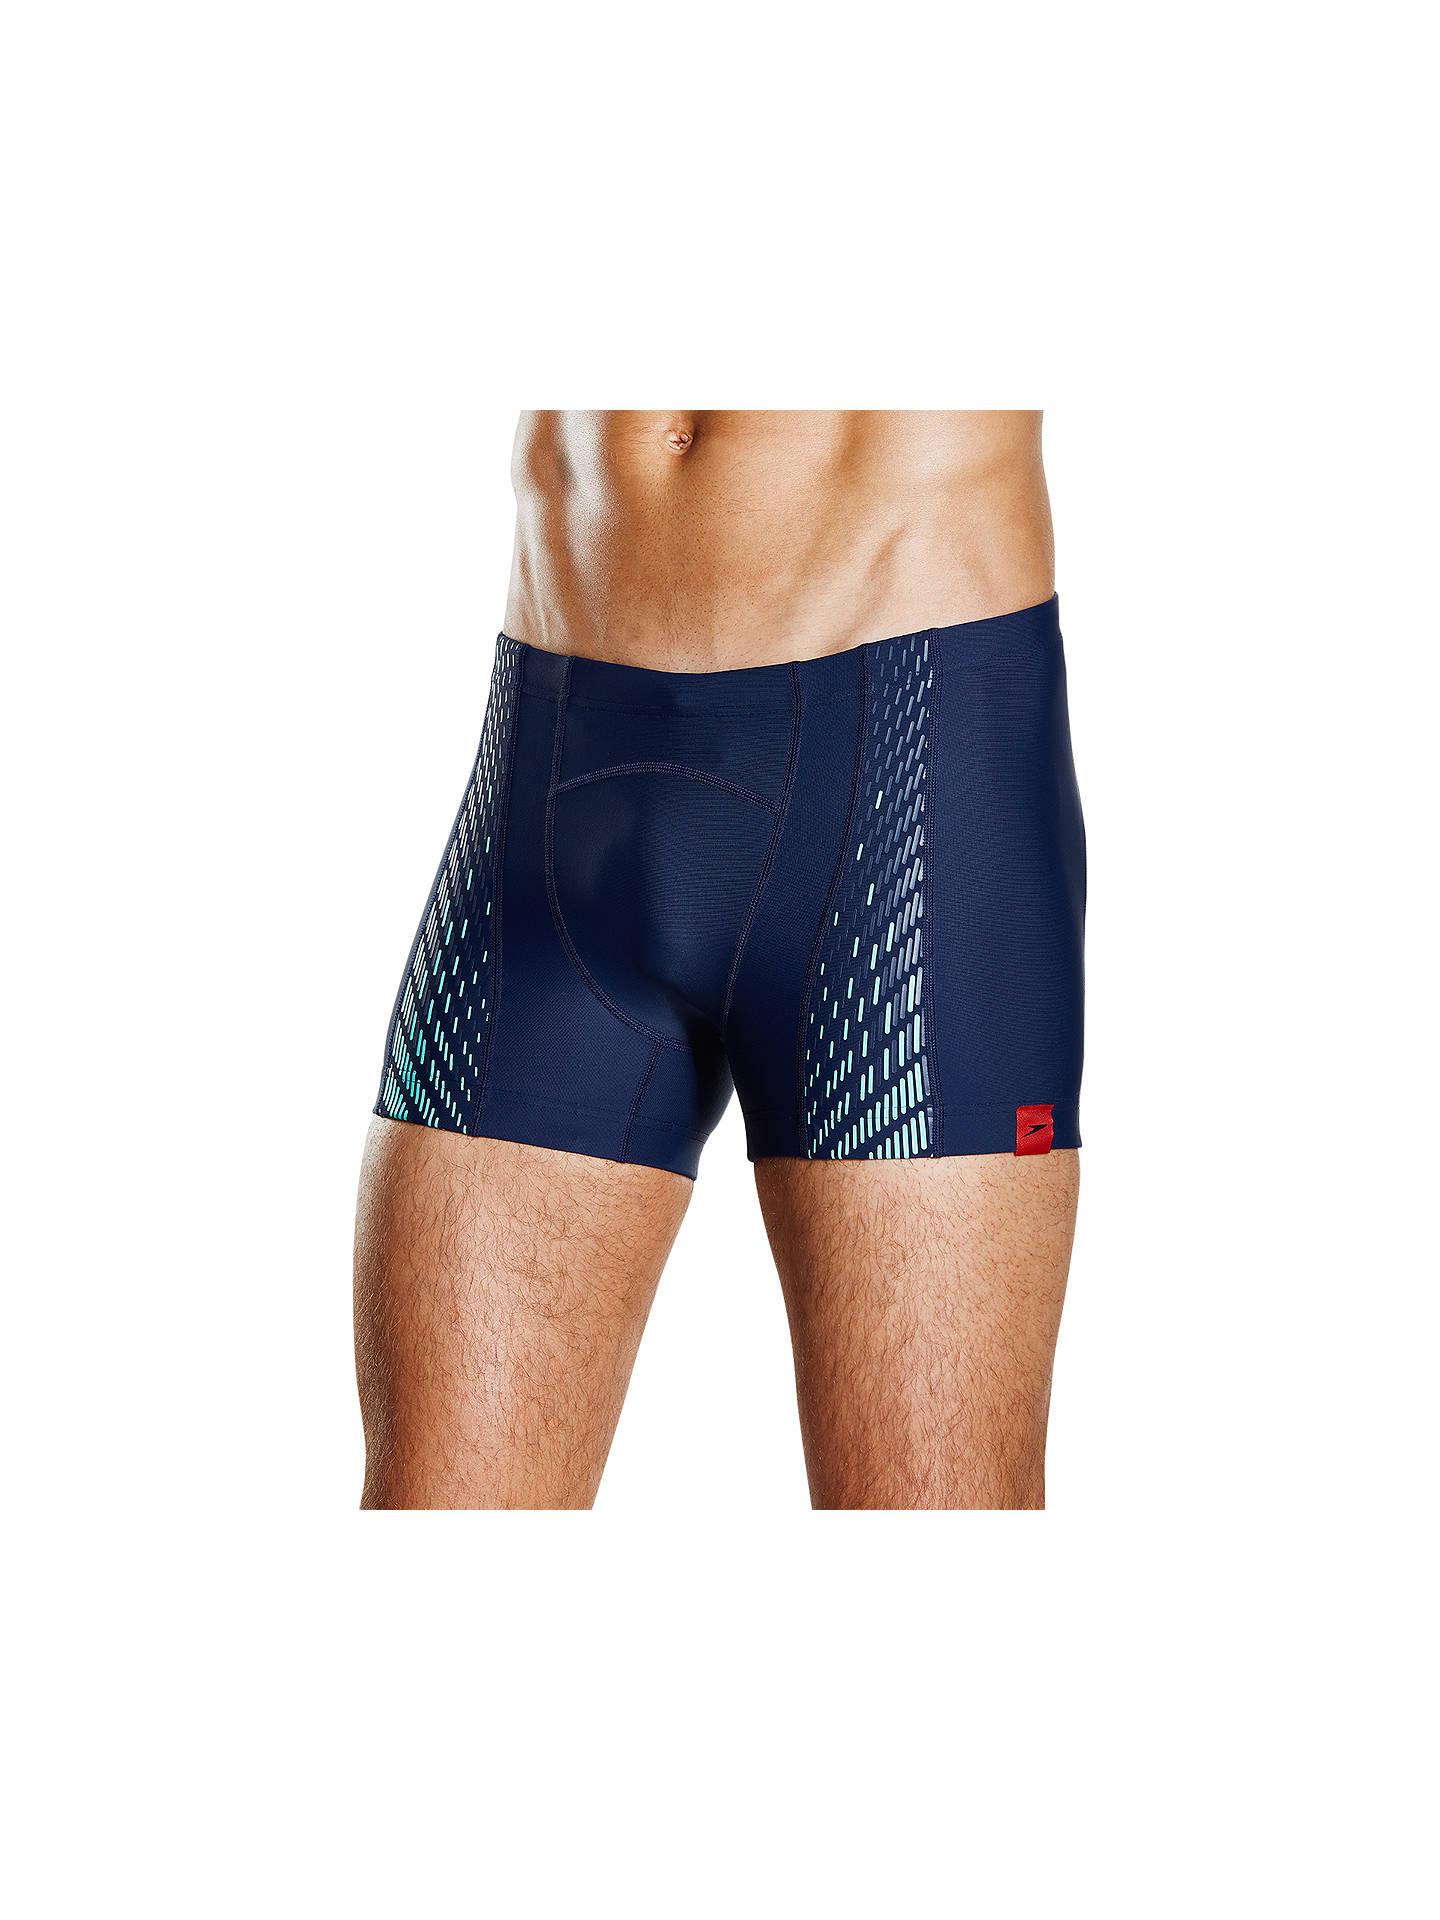 128937cb32 ... Buy Speedo Fit Power Mesh Pro Aquashort Swim Shorts,  Navy/Spearmint/Stellar, ...